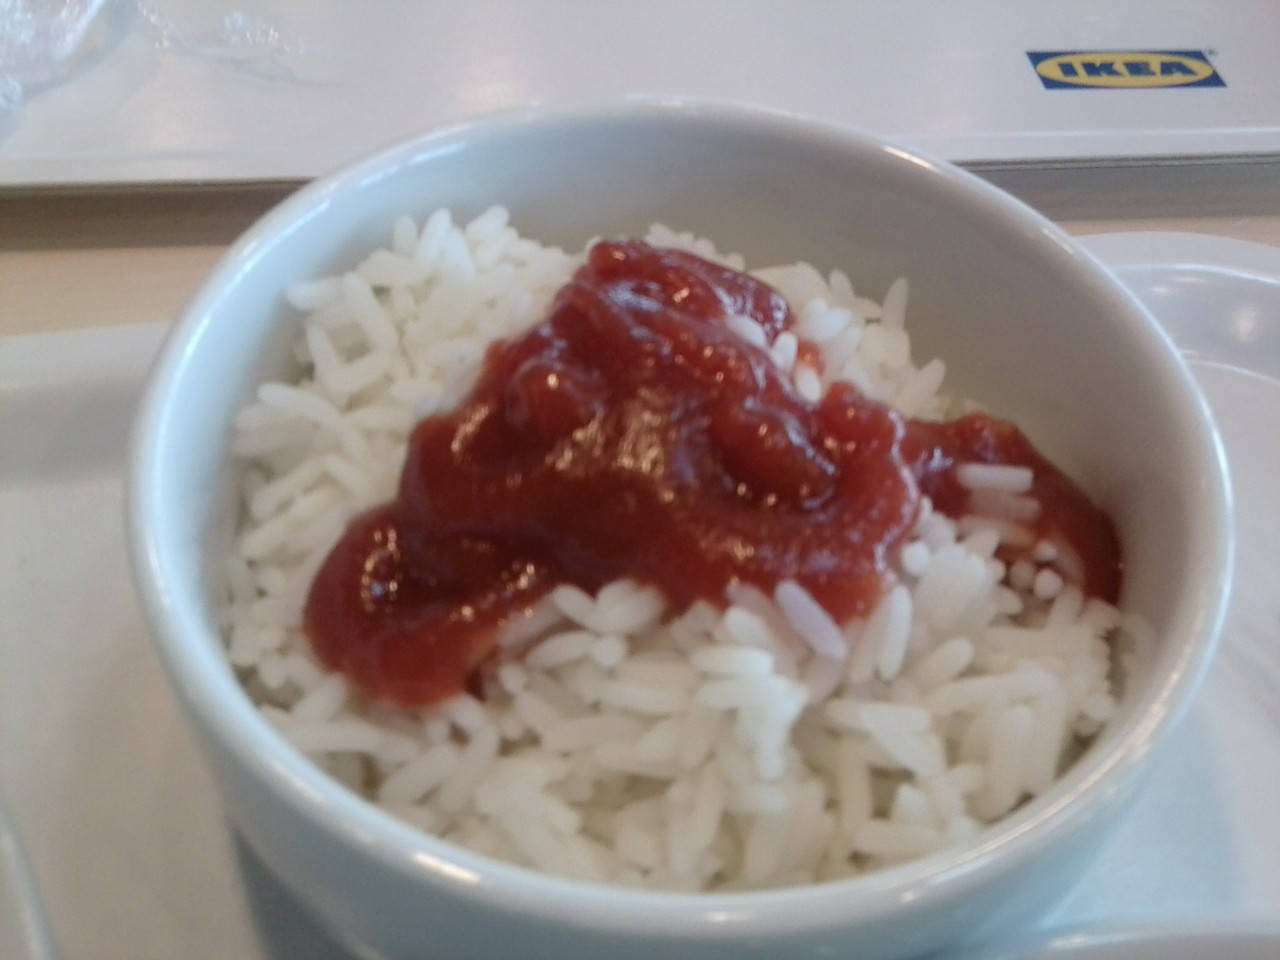 Reis mit Ketchup bei Ikea